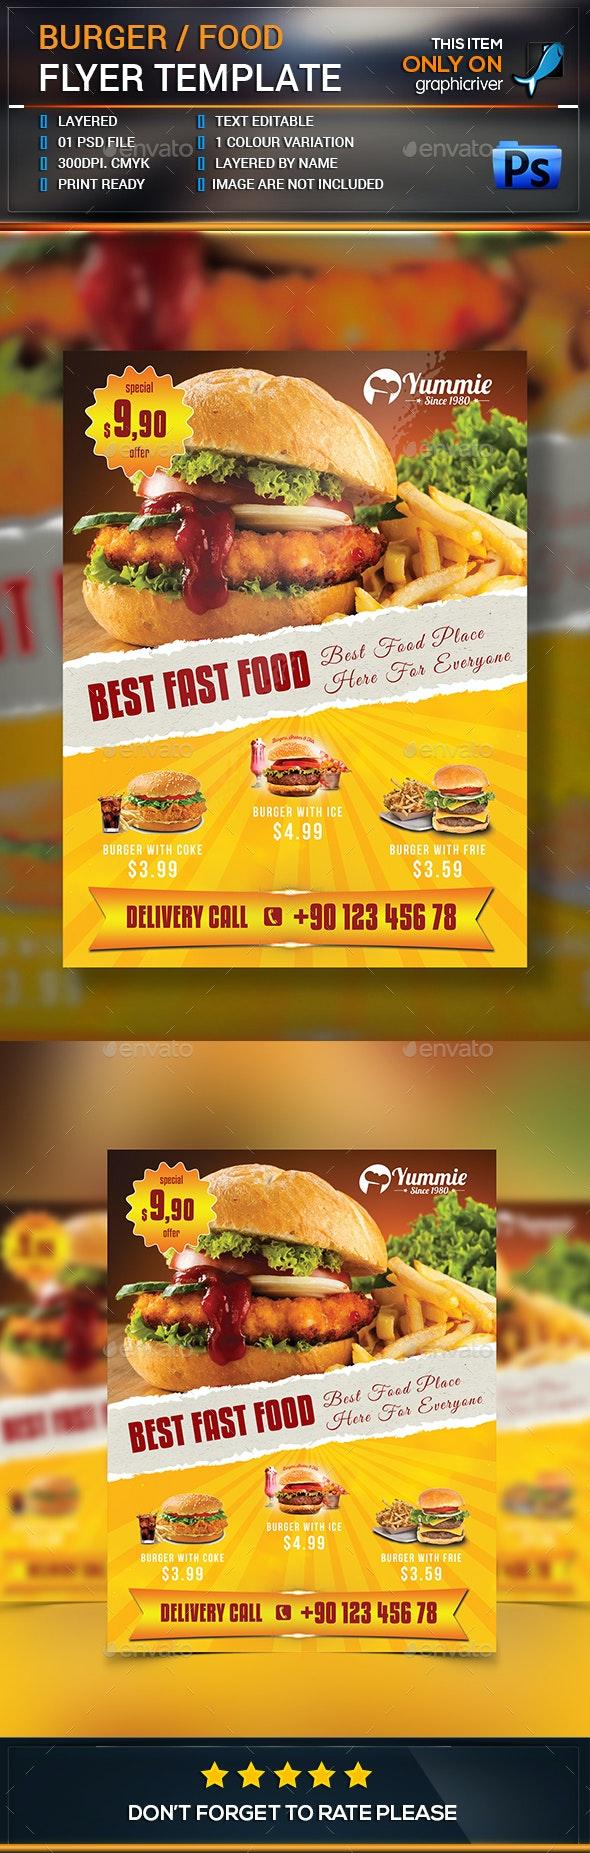 Burger/Food Flyer - Restaurant Flyers